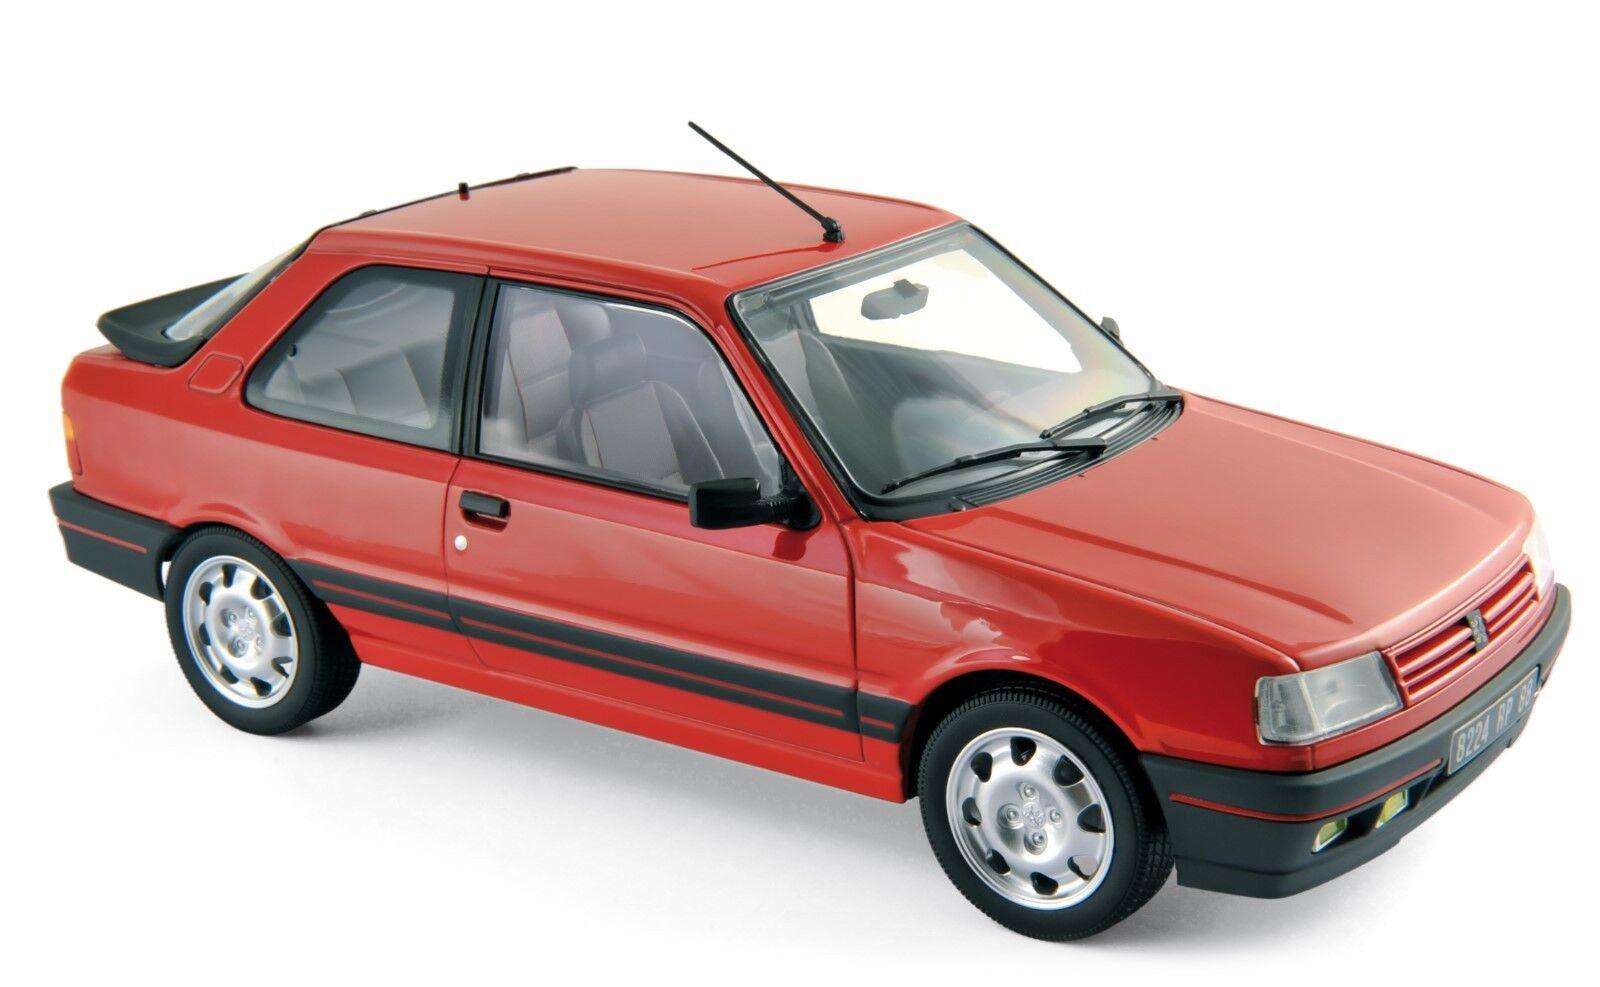 Peugeot 309 GTI 1987 rot 1 18 Norev 184880 184880 184880 neu & OVP  | Ausgezeichnete Leistung  d4b8e1